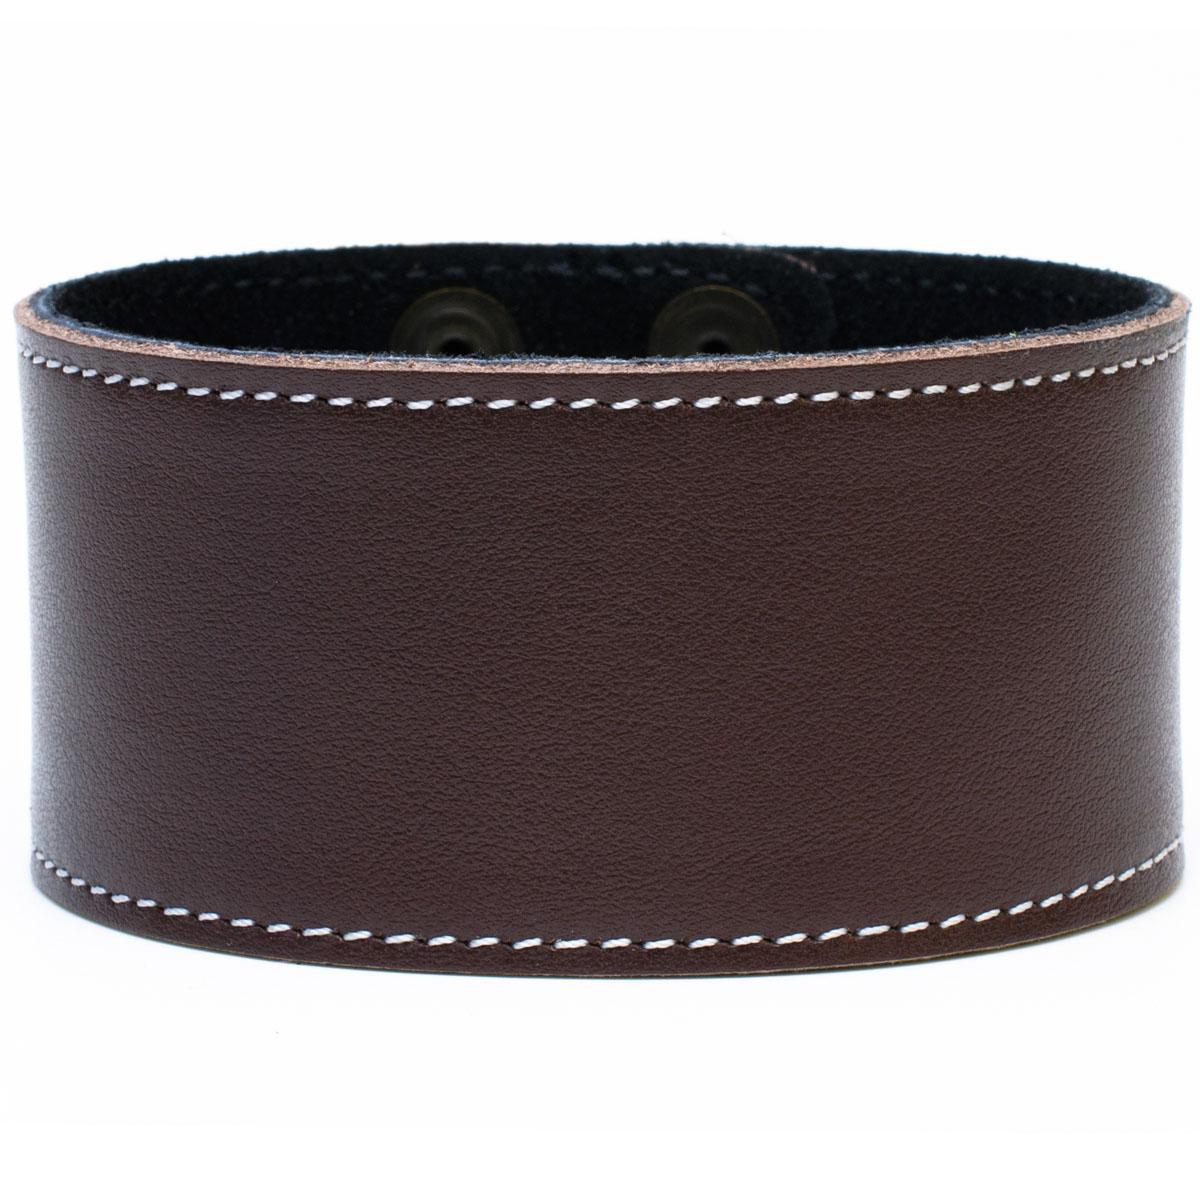 Lederarmband breit damen  Lederarmband breit echt Leder Armband Regular Unisex Braun